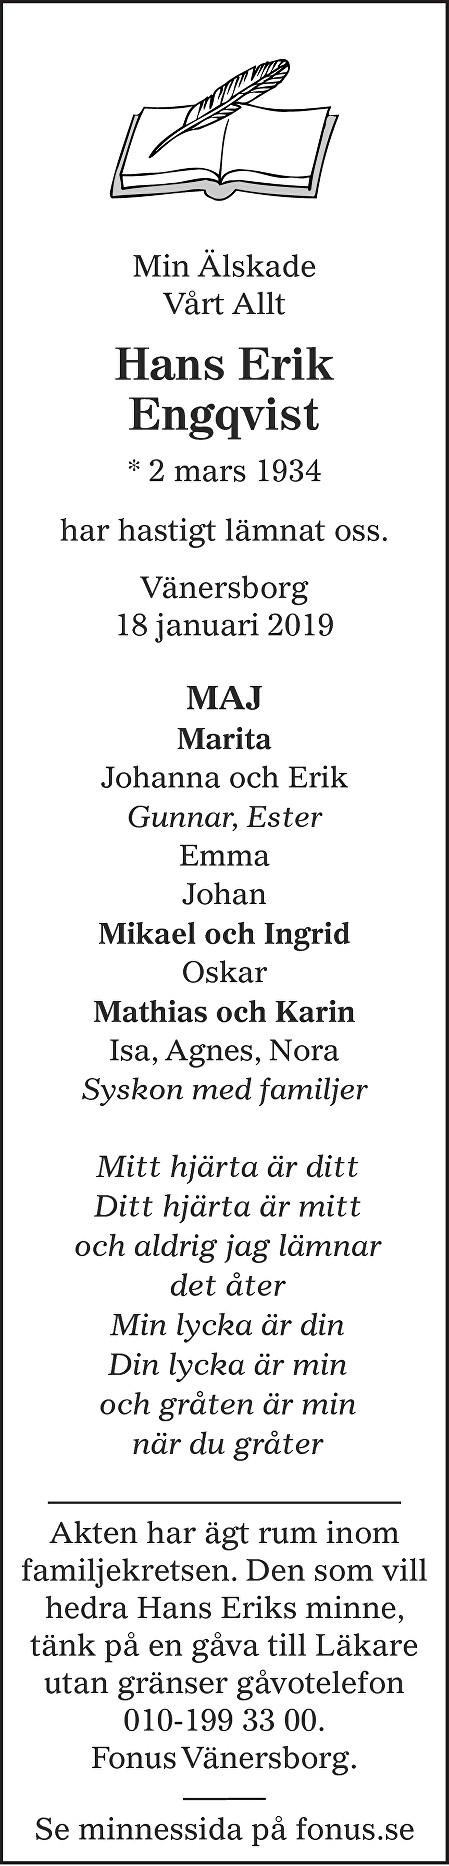 Hans Erik Engqvist Death notice